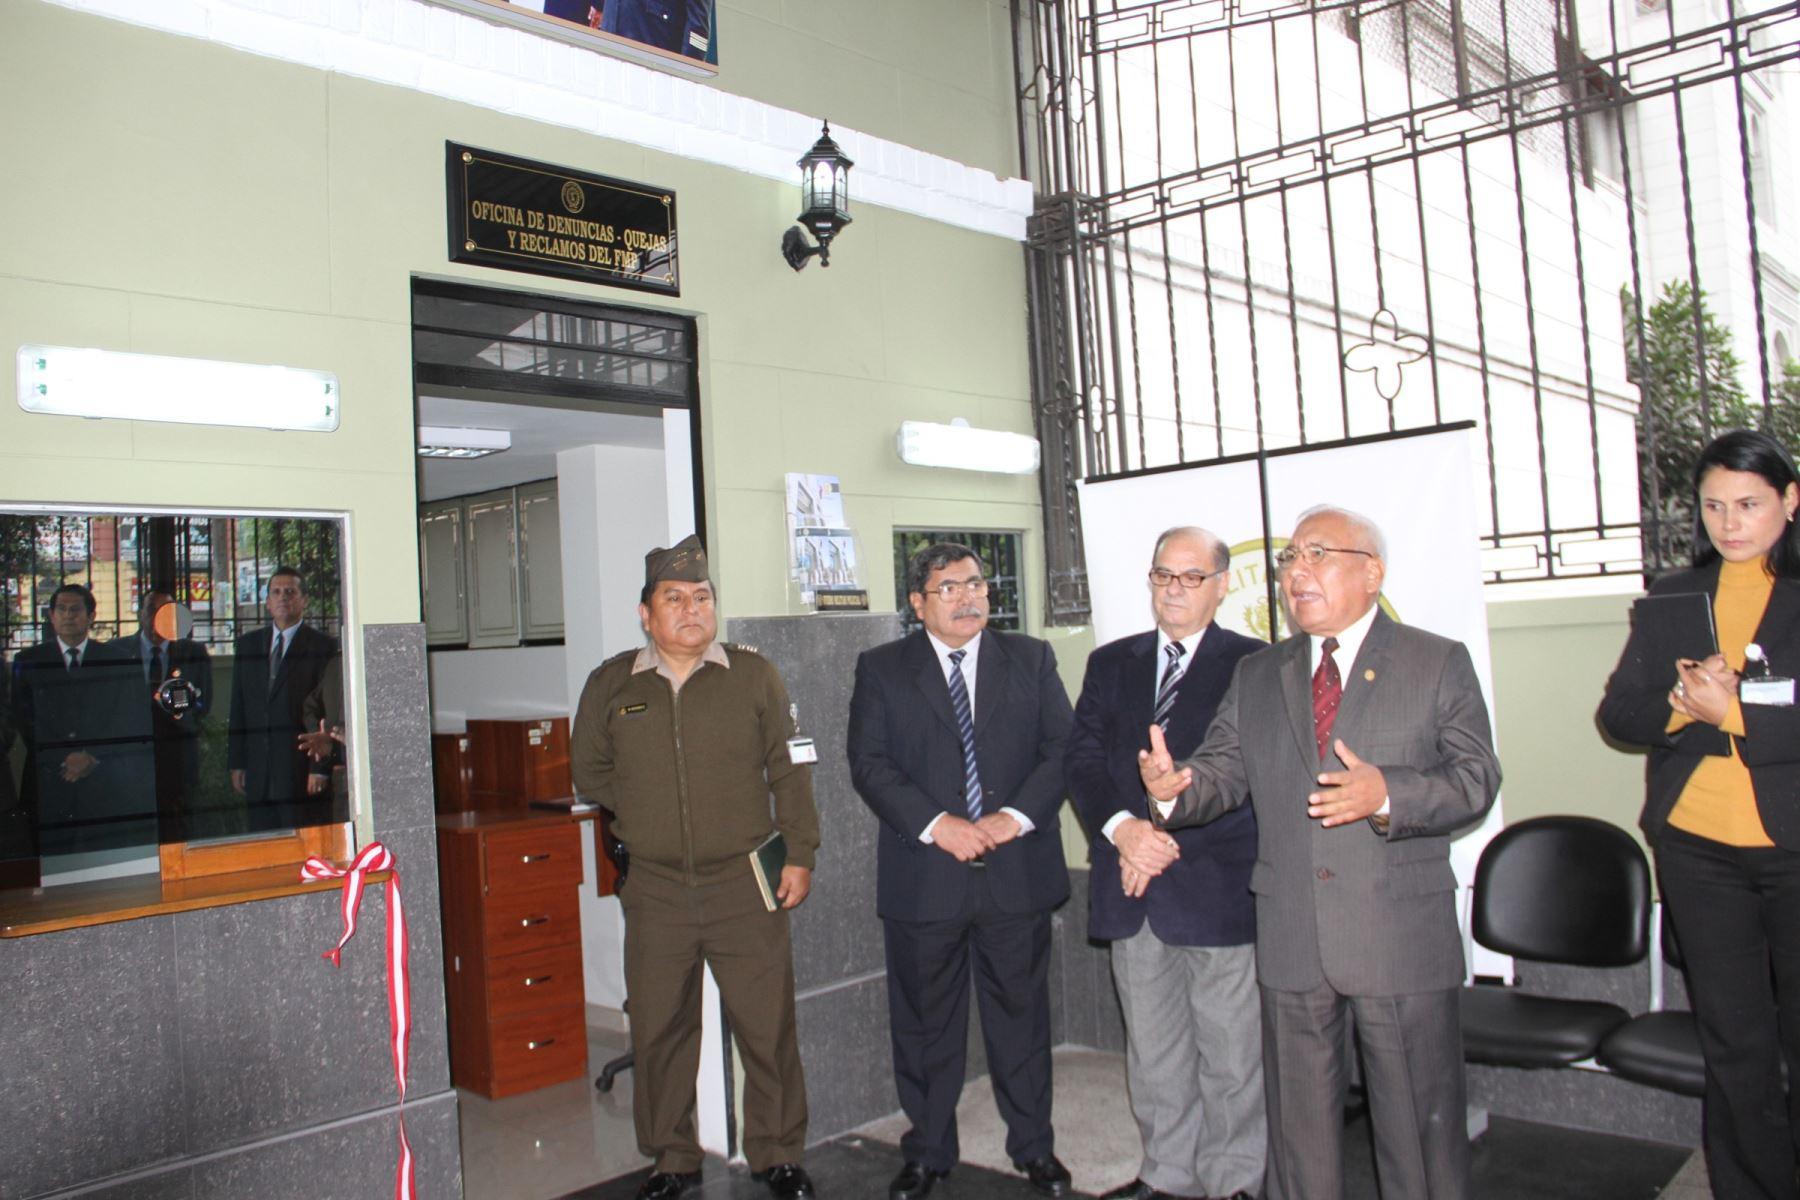 Fuero Militar Policial inaugura oficina de reclamos. Foto: Difusión.